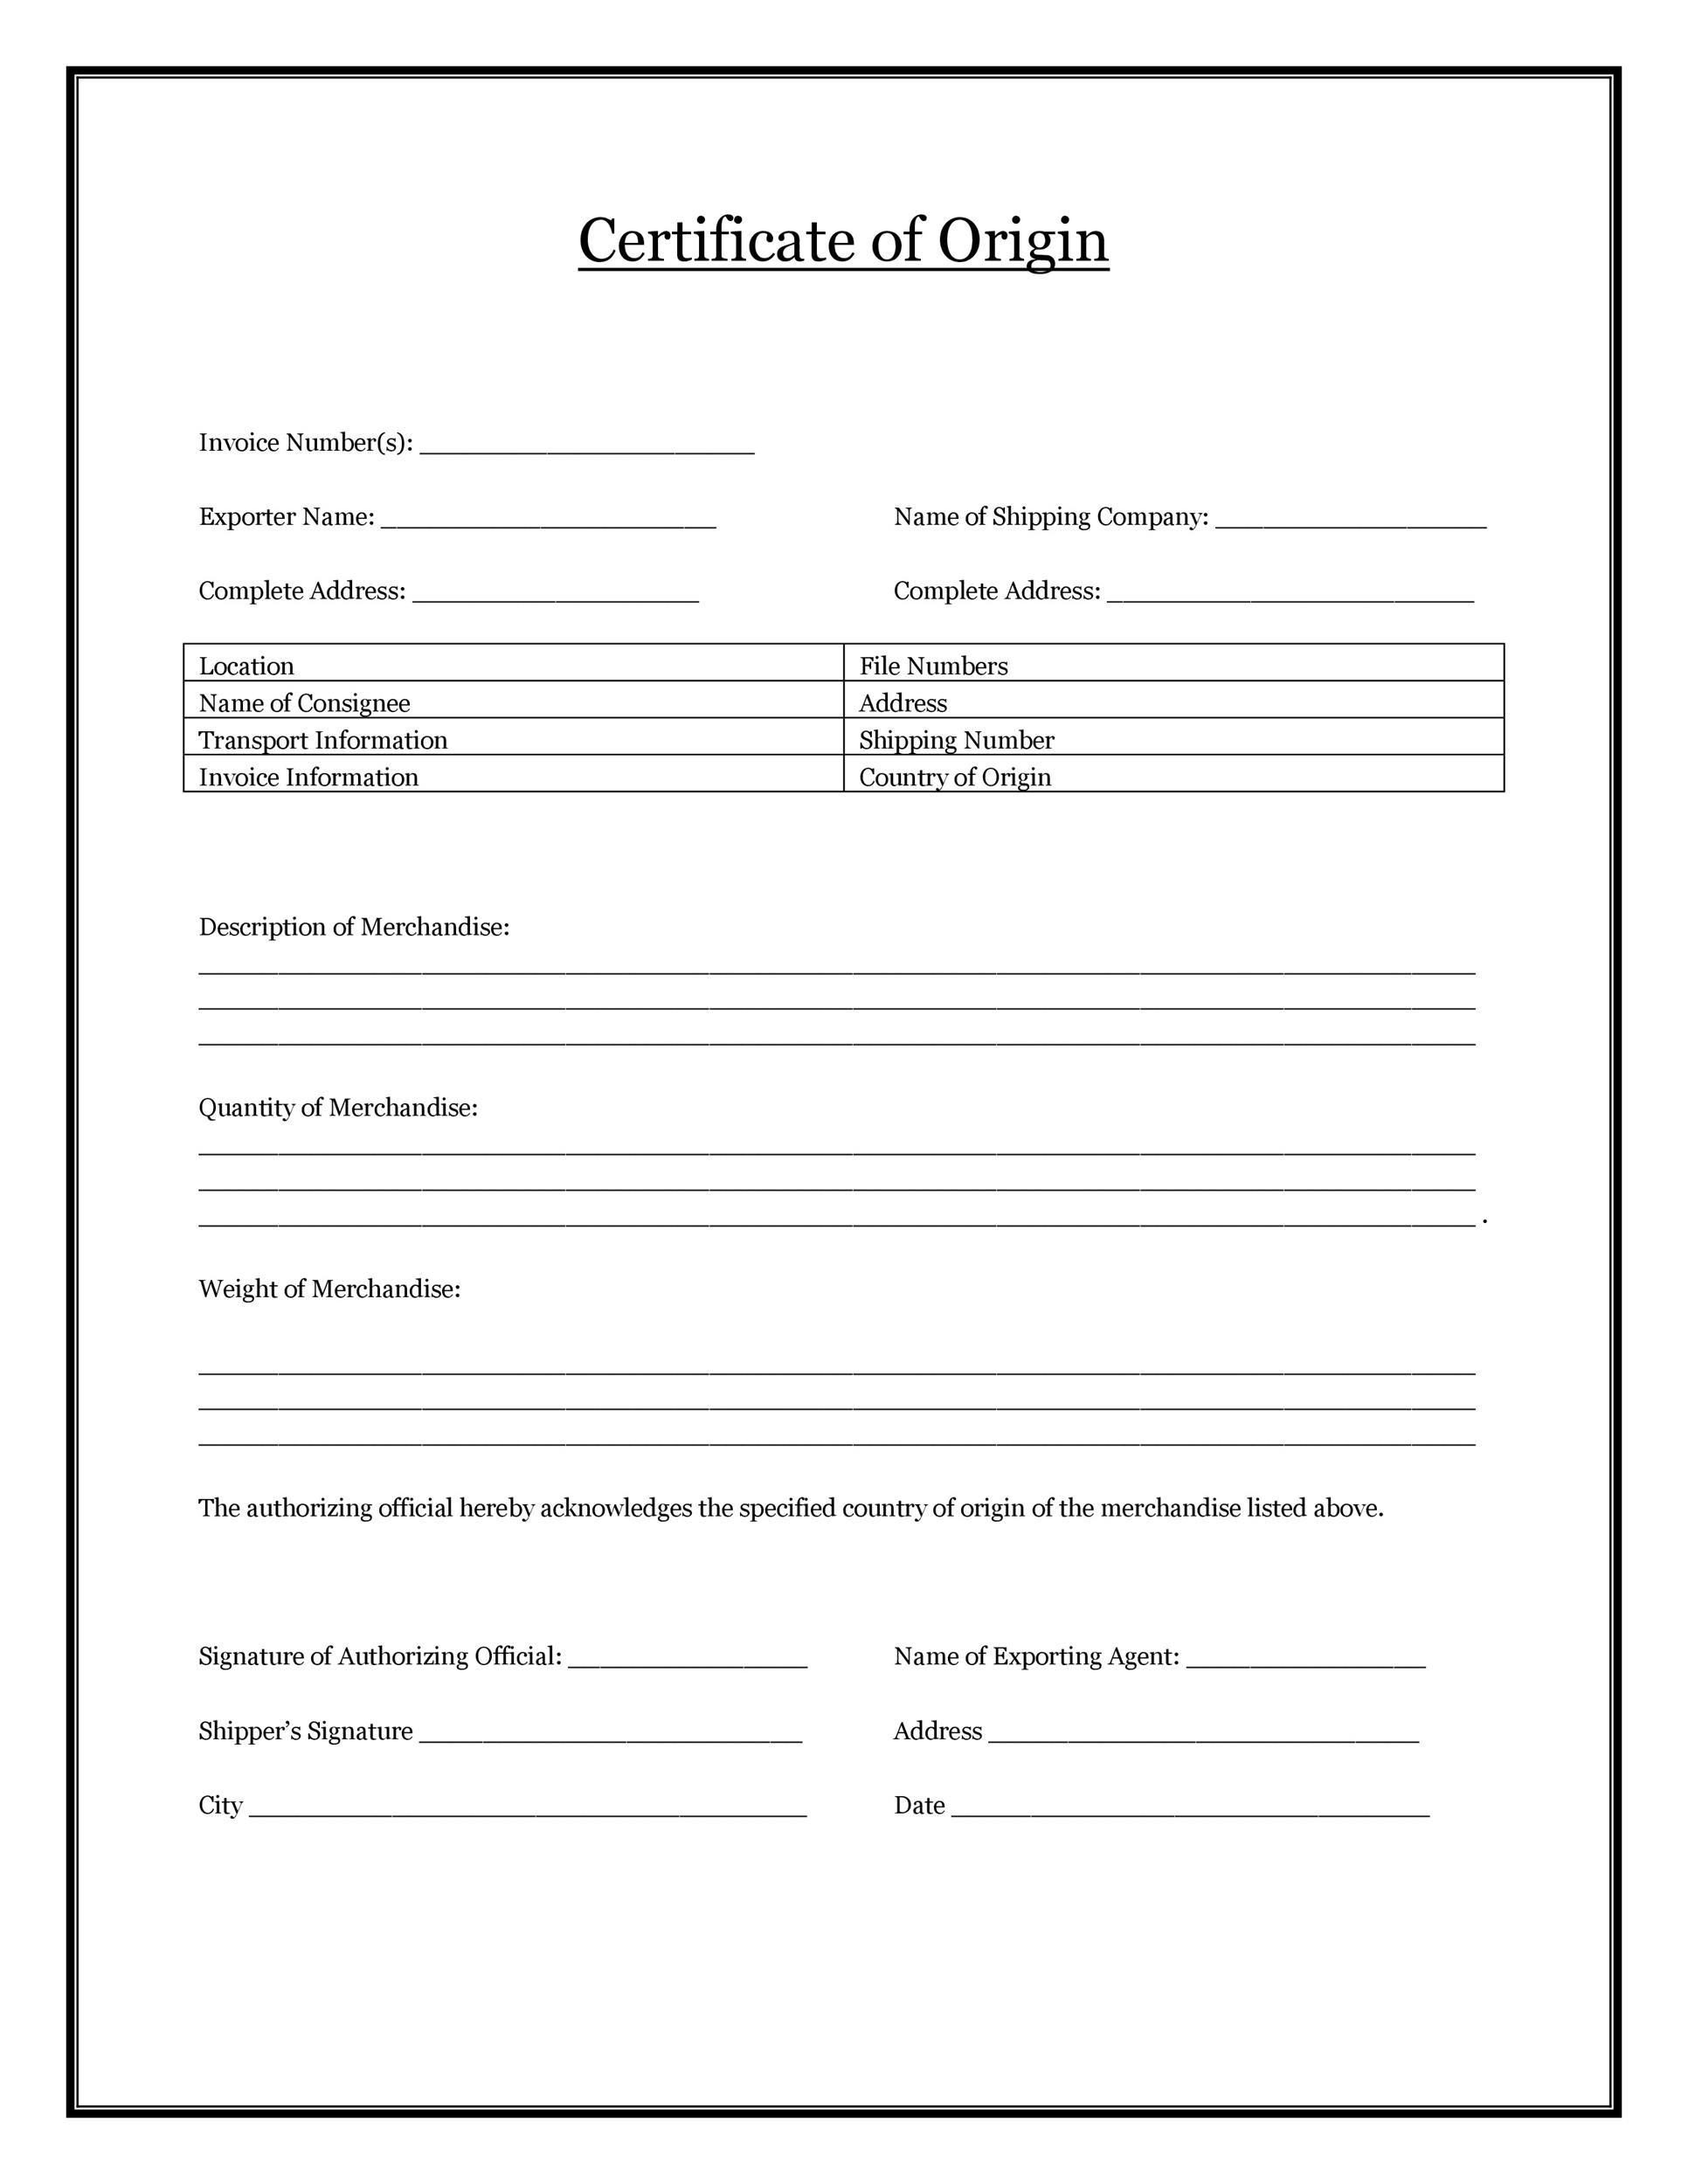 Free certificate of origin 20